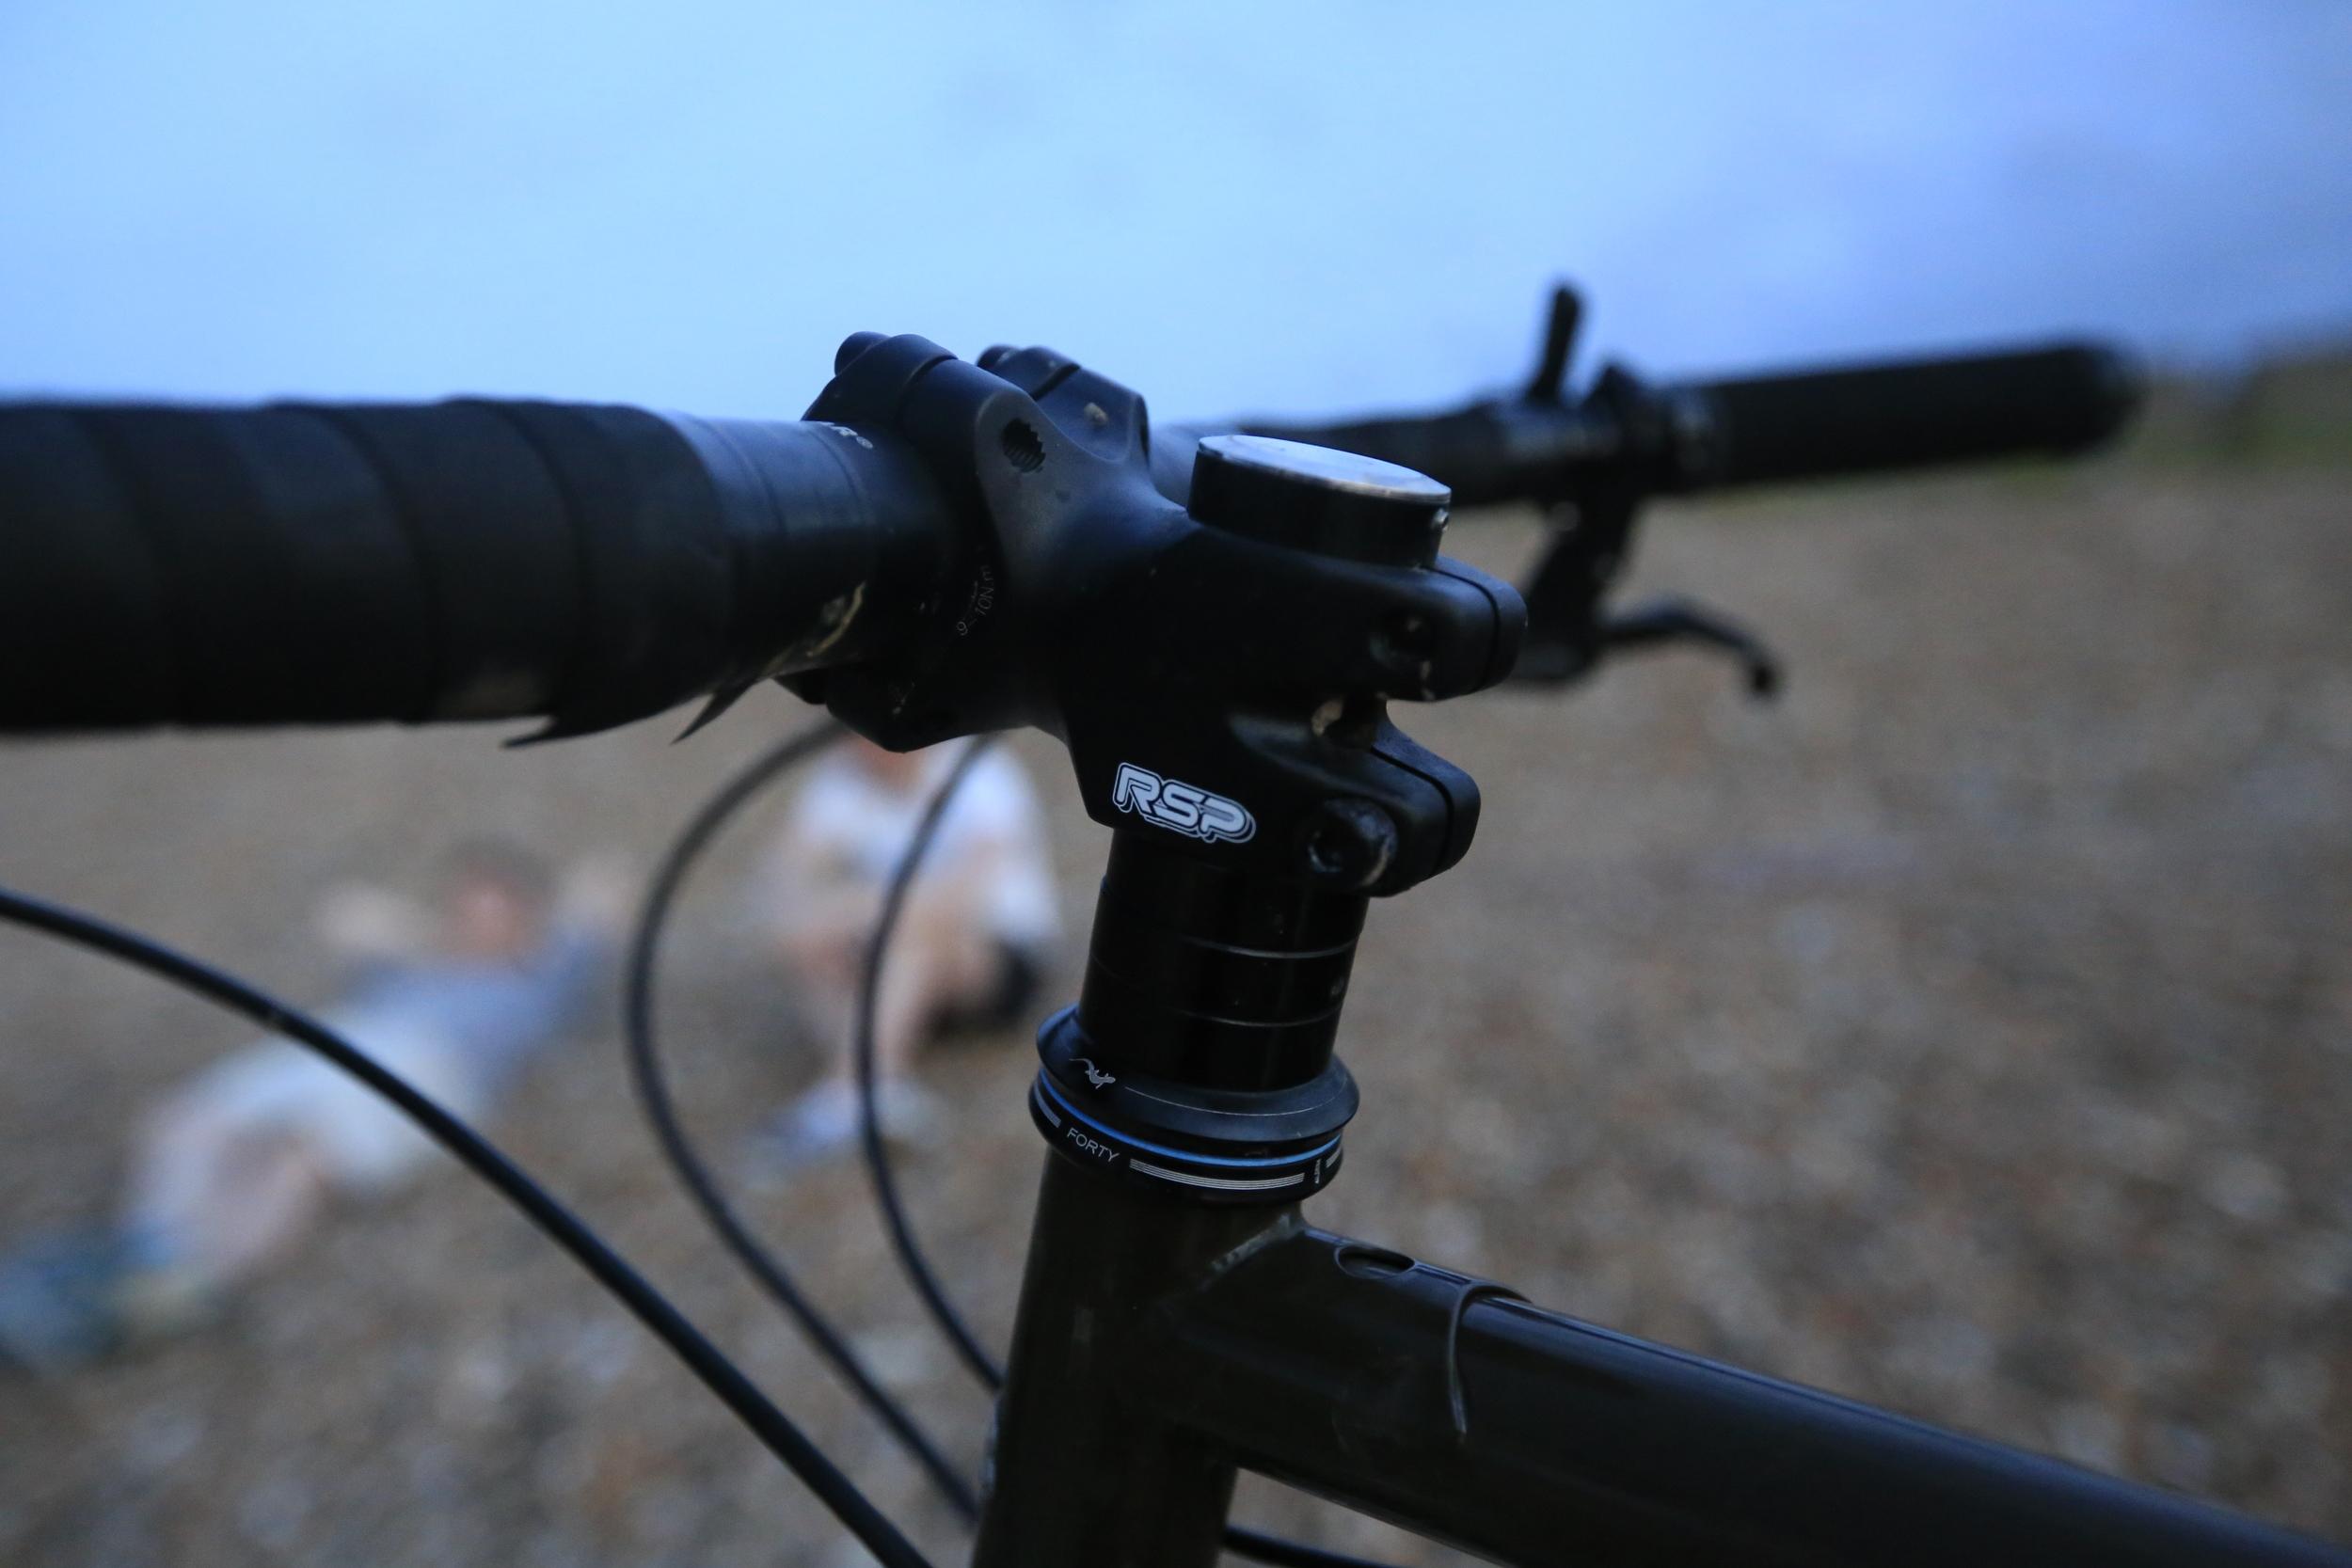 rsp, raleigh bikes, jones h bar, stemcaptain, grip tape, steel frame, surly, surly ecr, cycling gear, touring bike, touring bikes, bike gear, adventure cycling, ride, bikepacking,